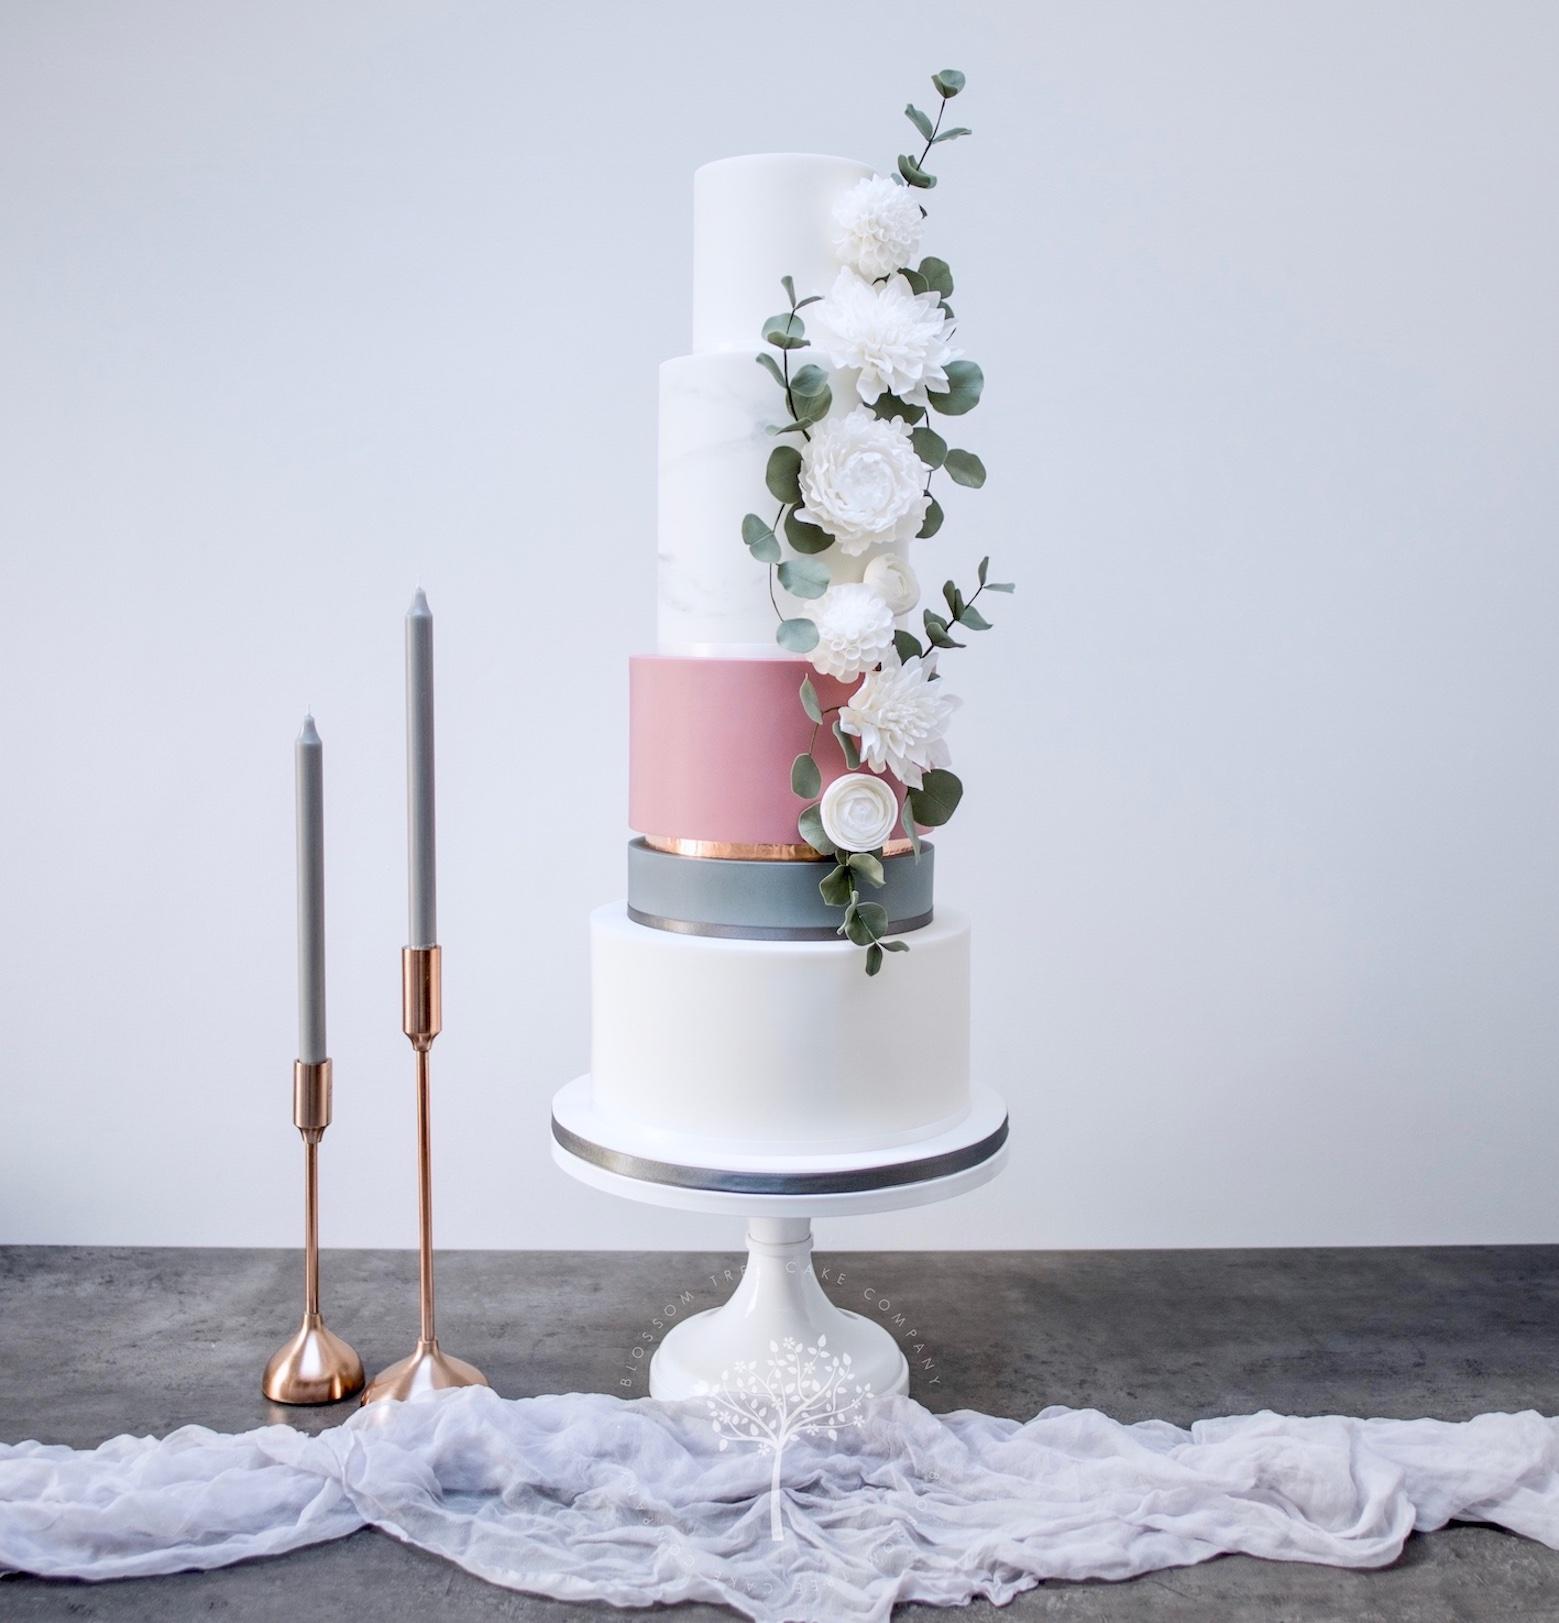 Marble & White Dahlias wedding cake by Blossom Tree Cake Company Harrogate North Yorkshire - square.jpg